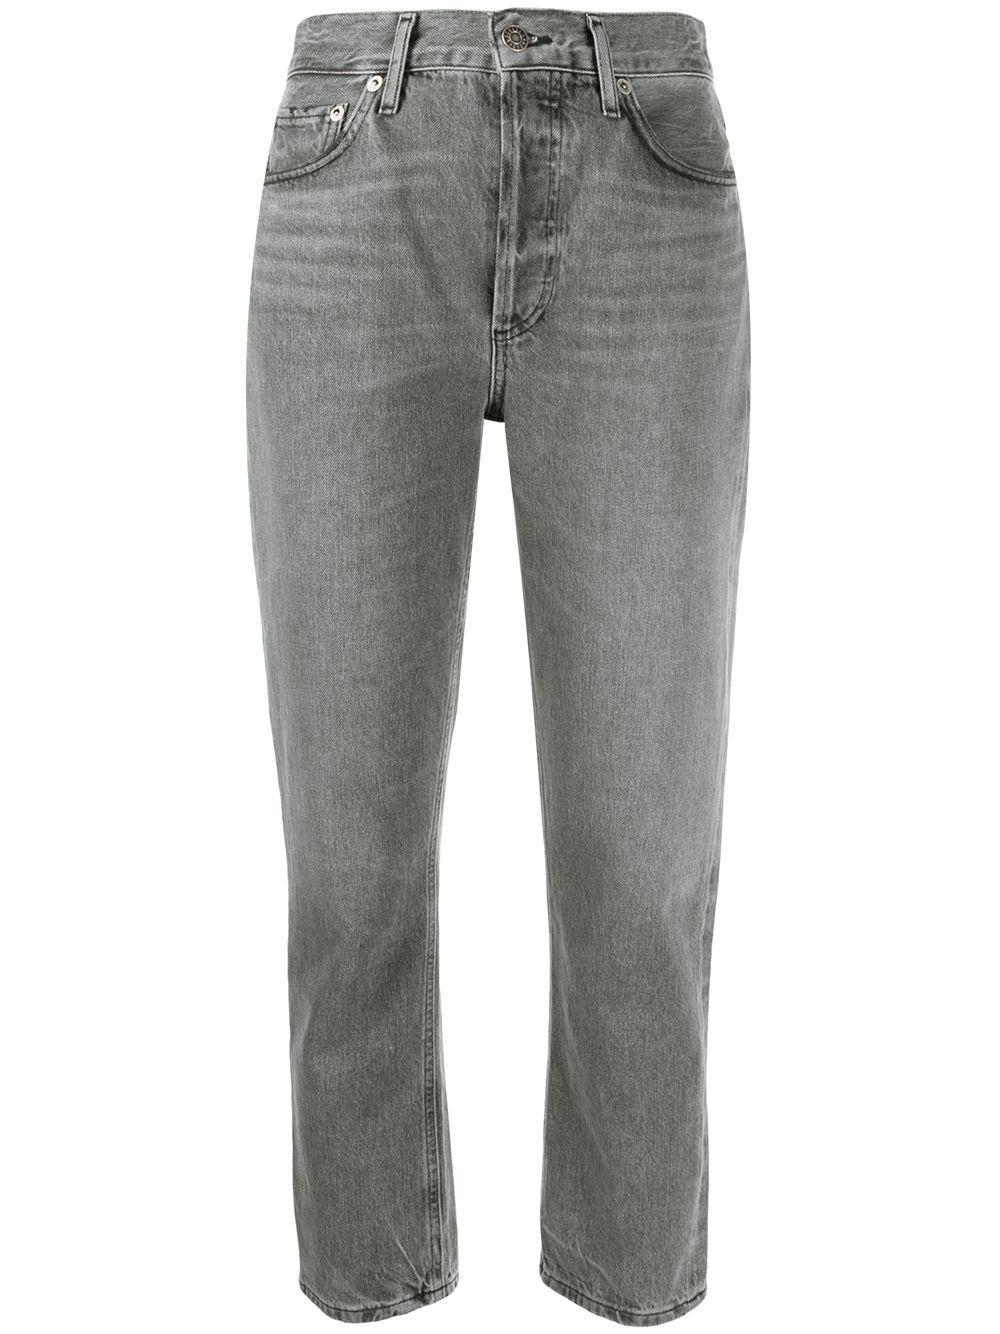 Riley Cropped Straight Leg Jean Item # A056C-1157